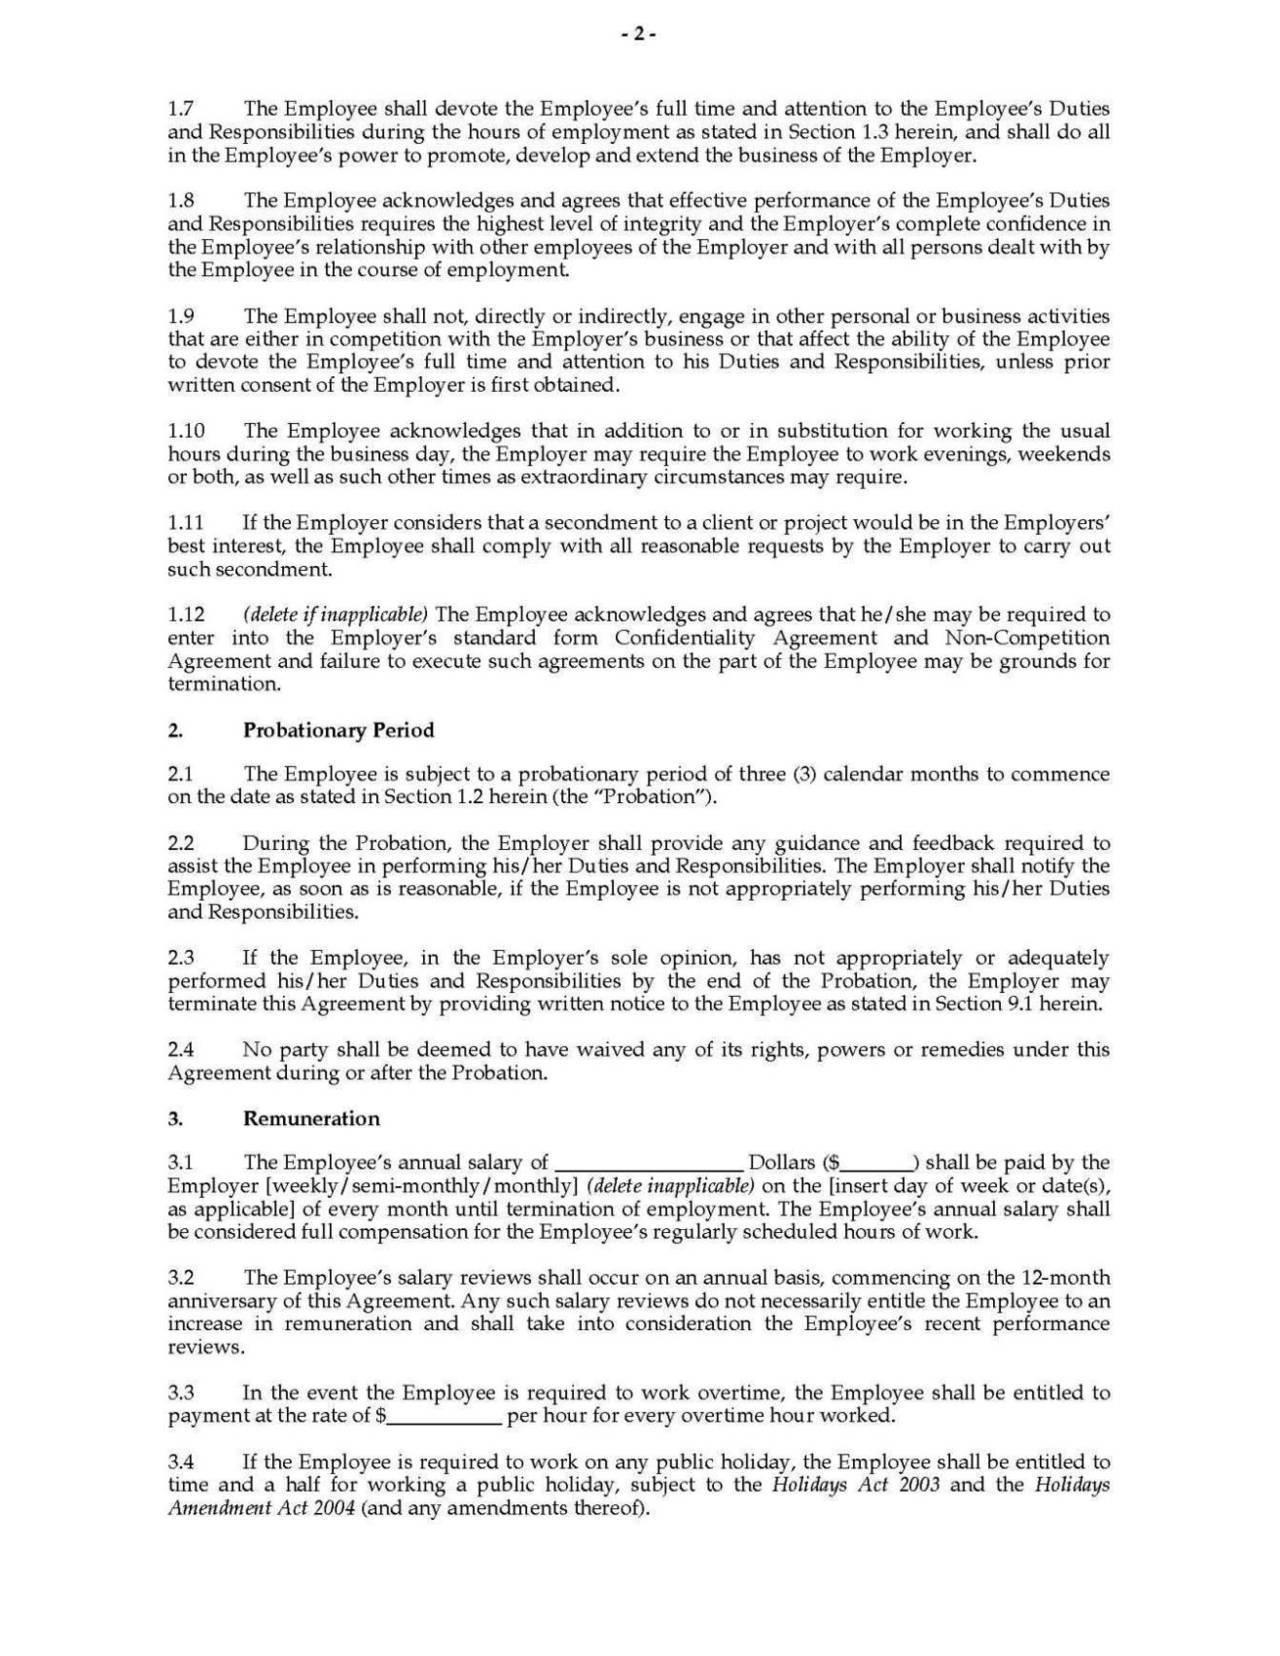 secondment agreement template